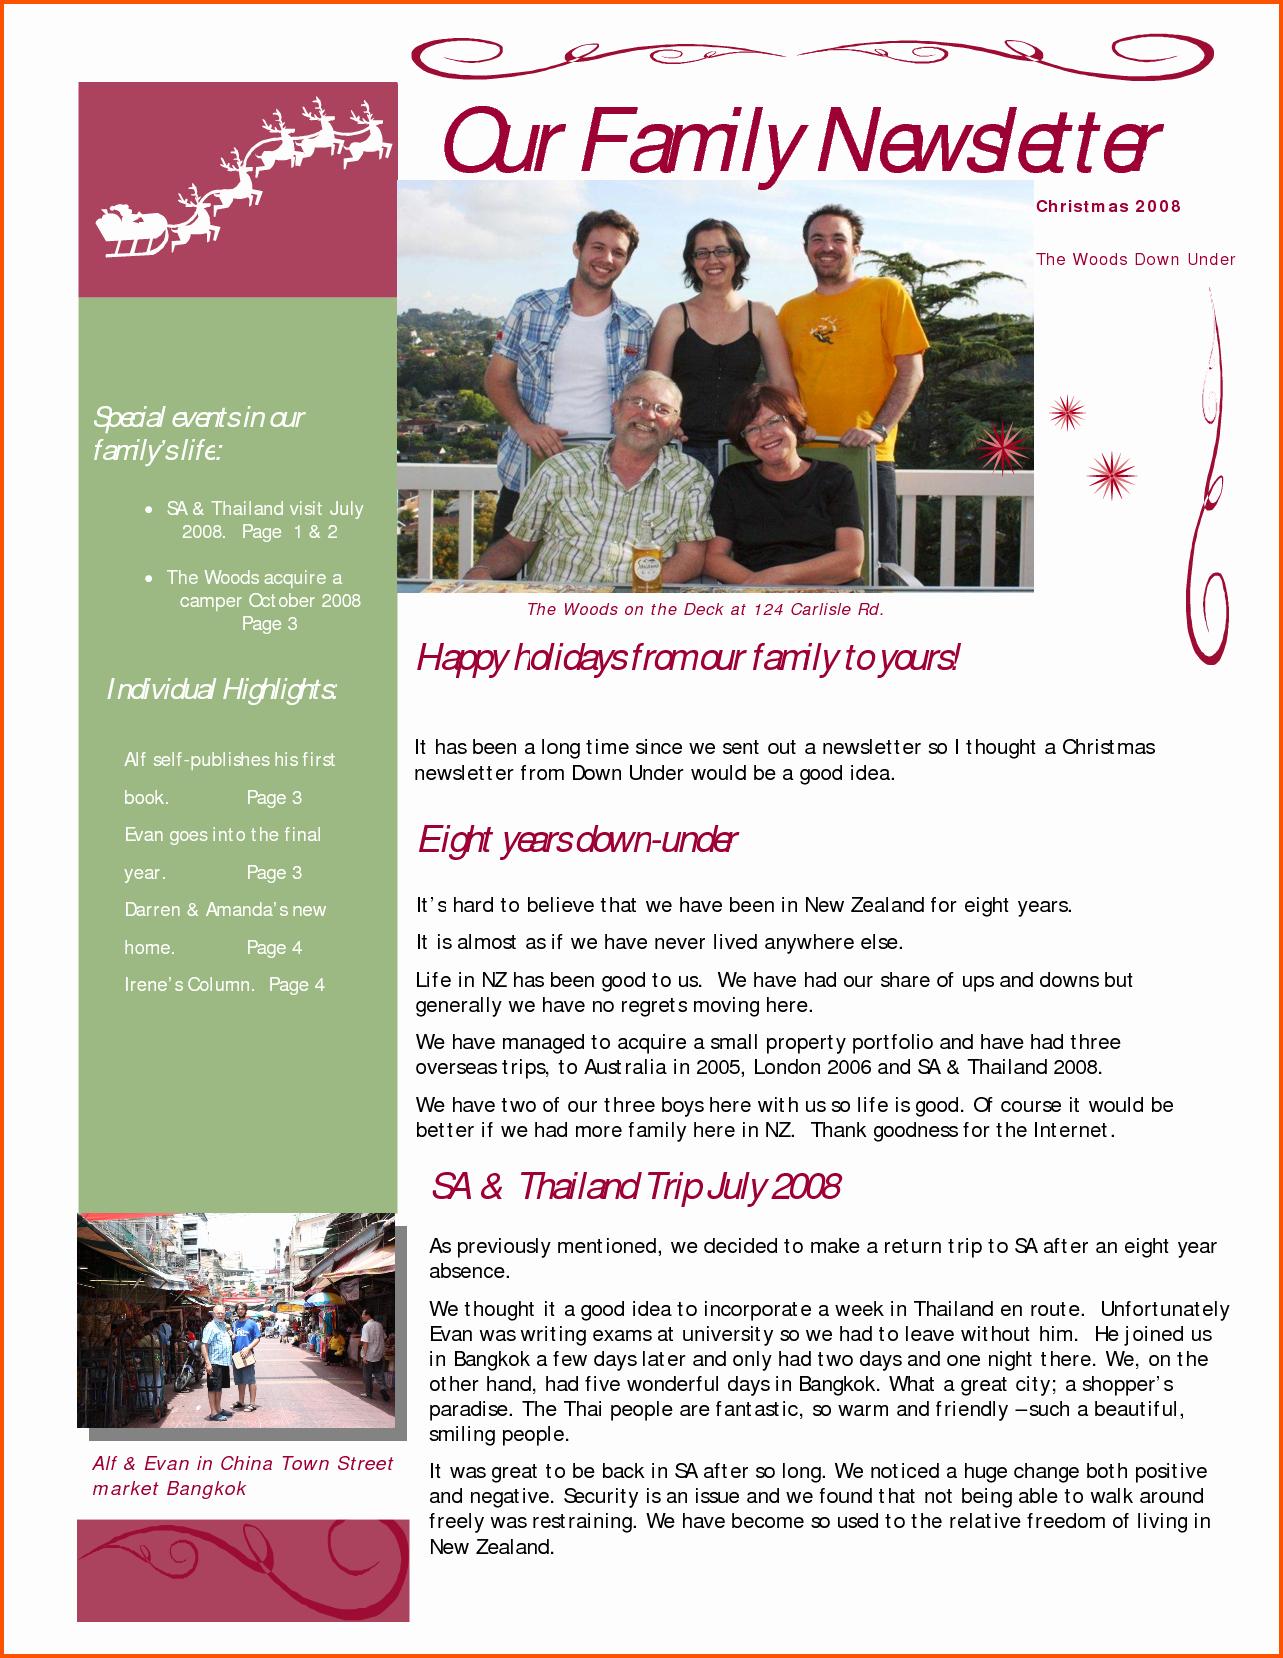 Christmas Family Newsletter Template Free Inspirational Family Newsletter Templates Free